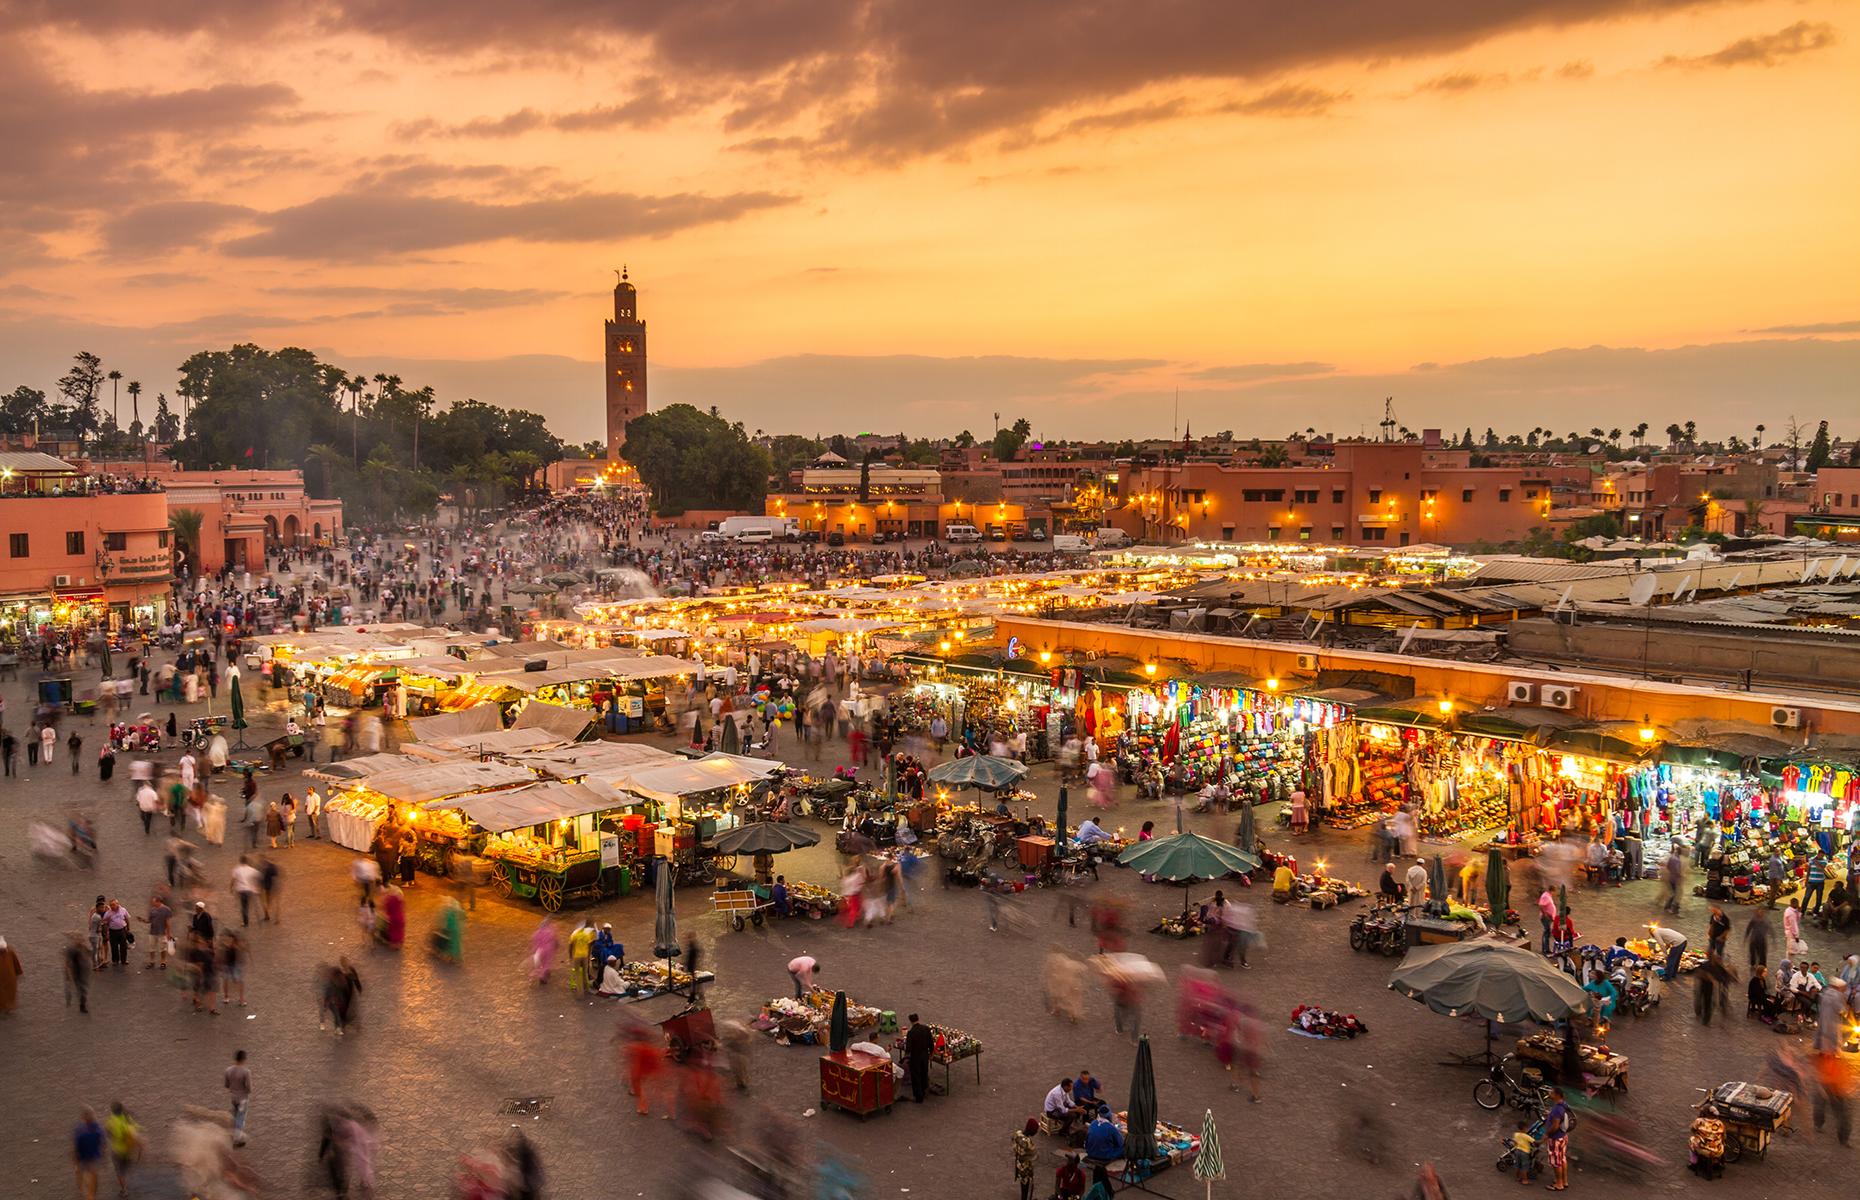 Jemaa el-Fna square in Marrakech (Image: Matej Kastelic/Shutterstock)